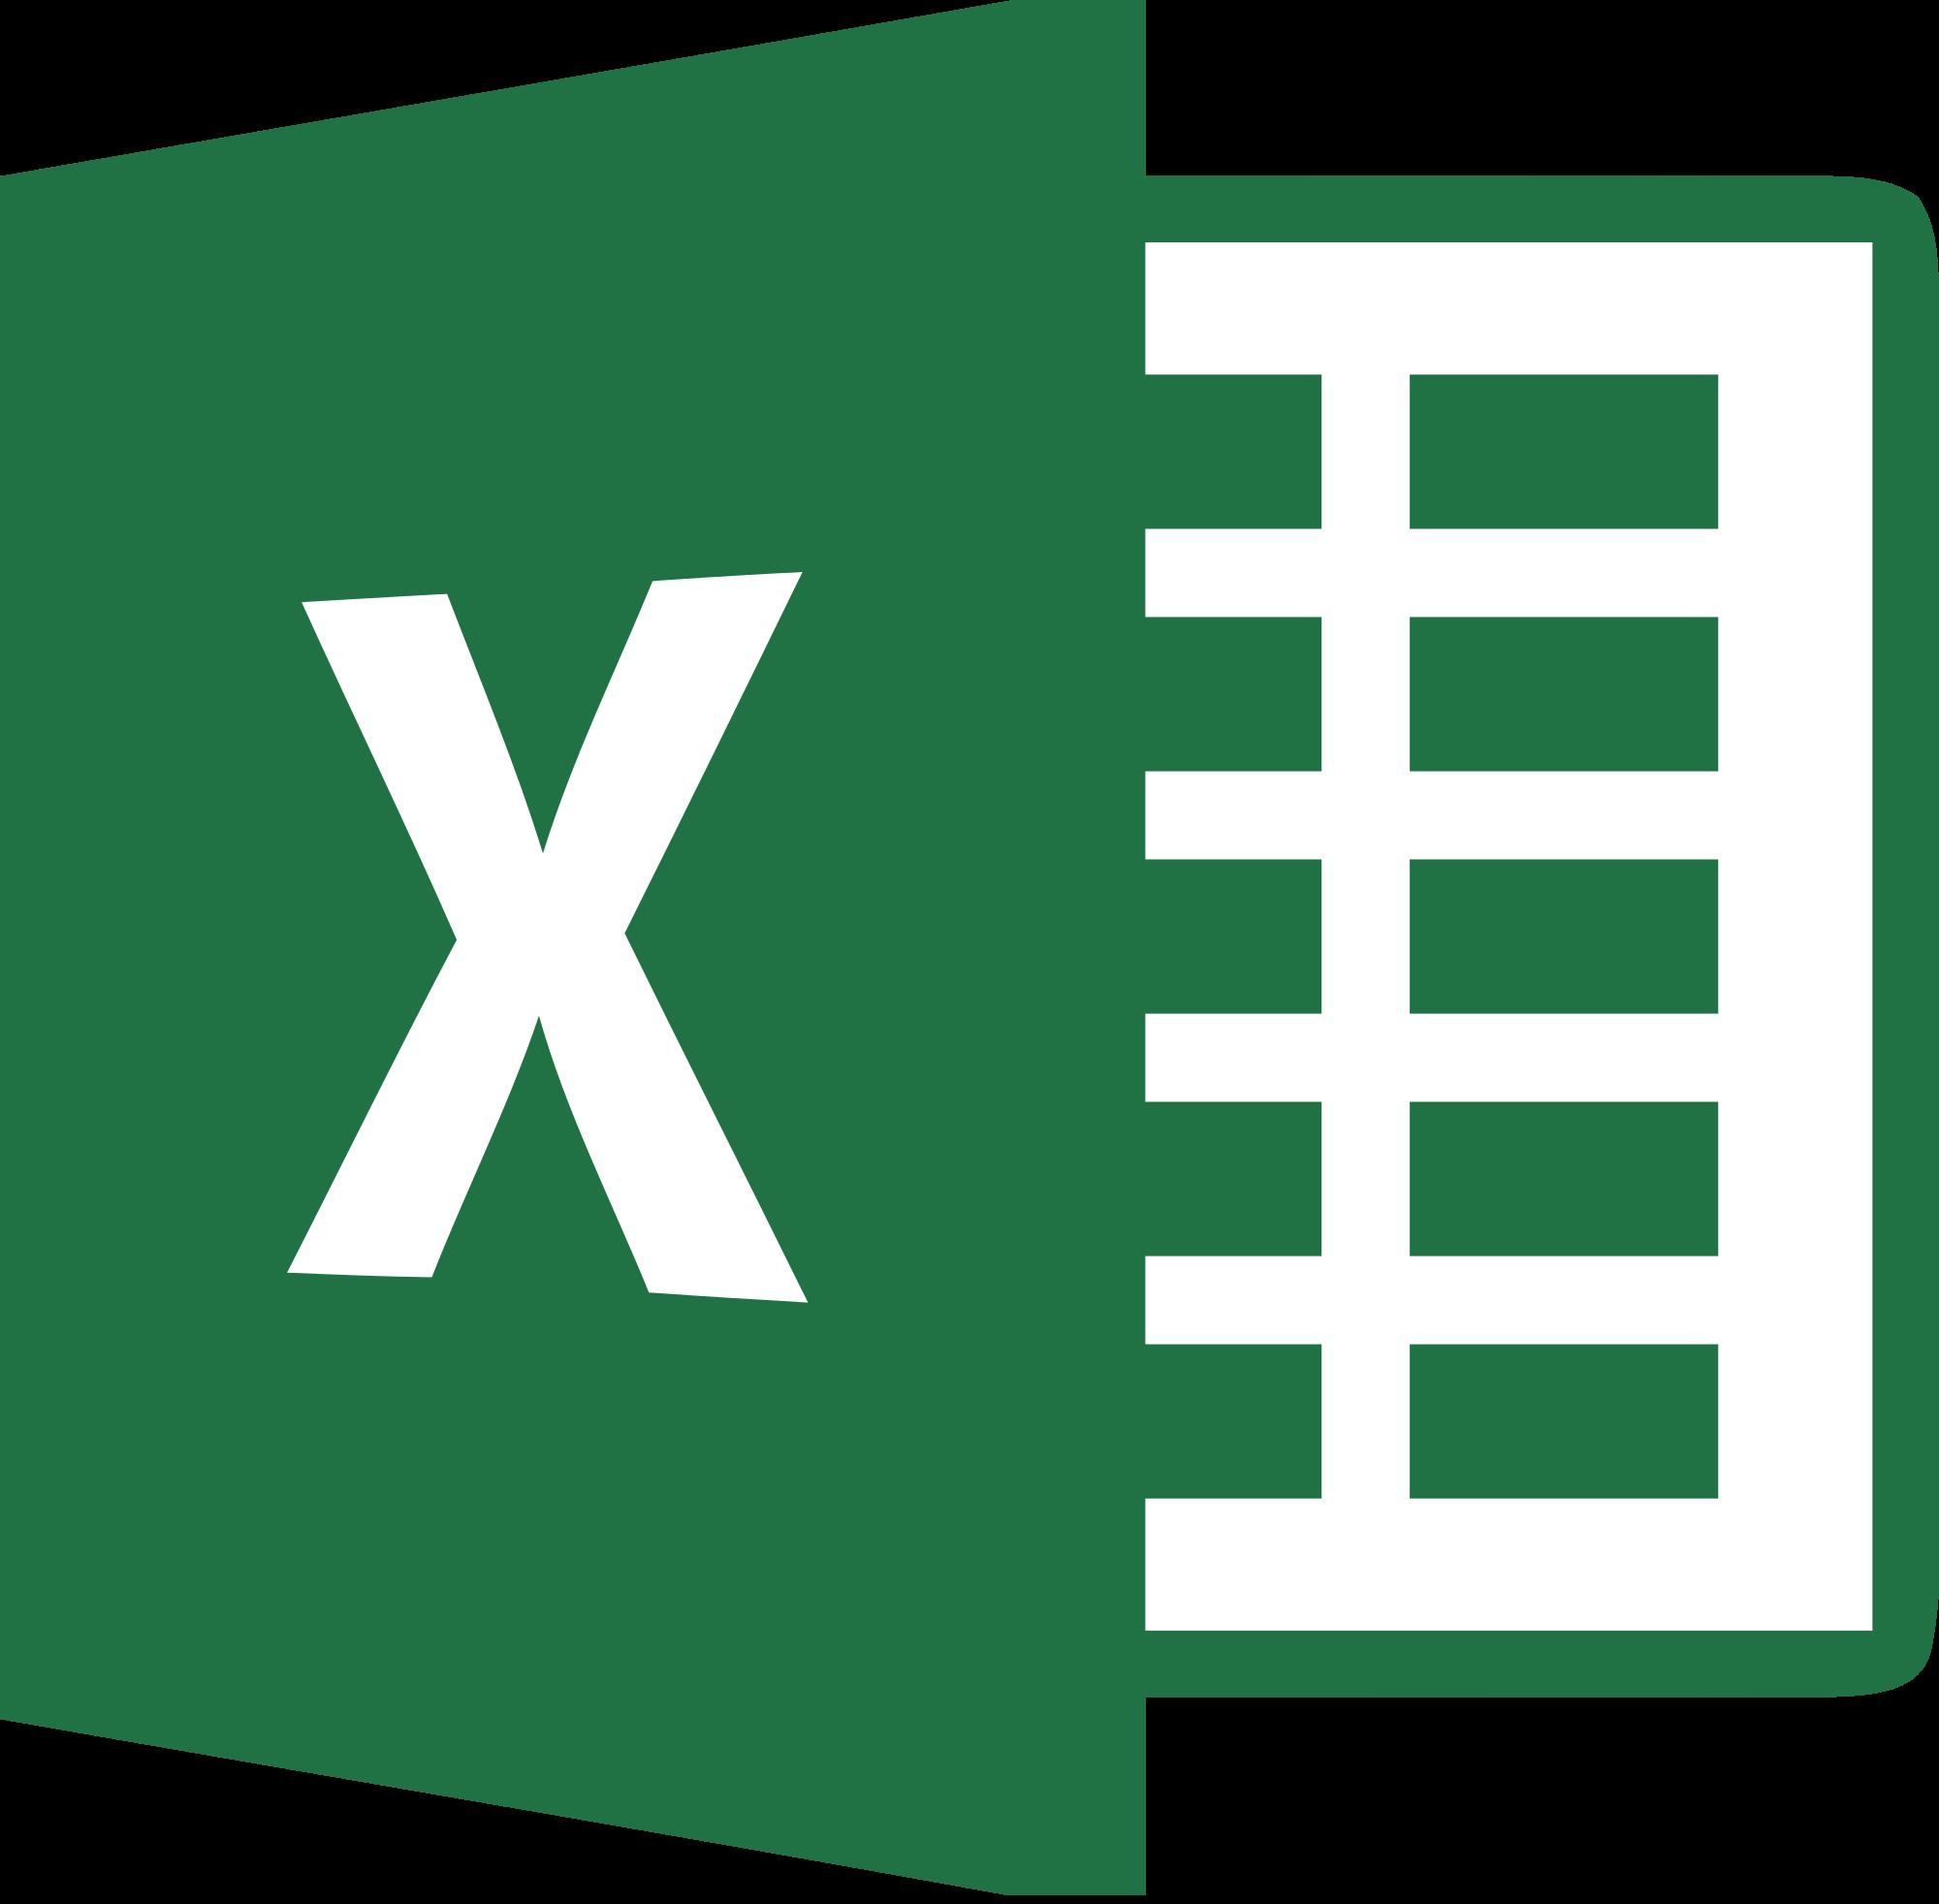 Microsoft_Excel_2013_logo1.png